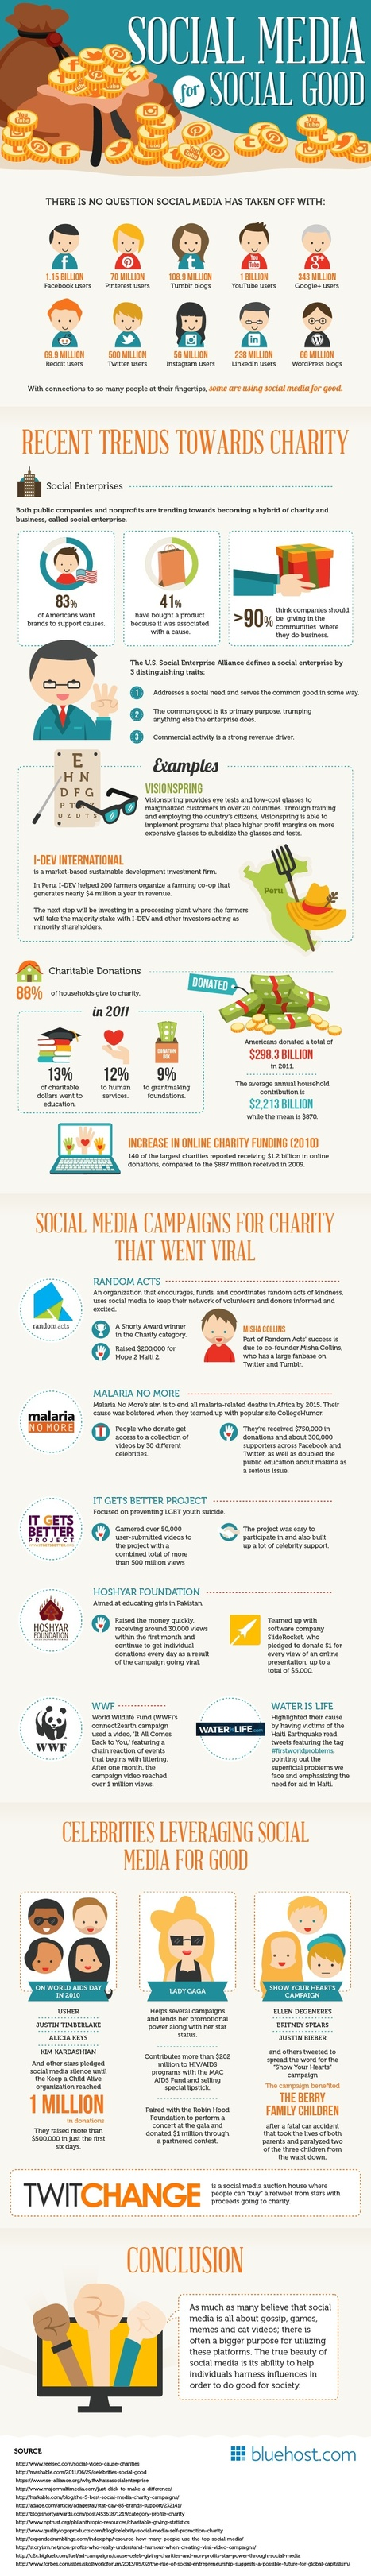 Using Social Media For Social Good (Infographic)   Social Media   Scoop.it